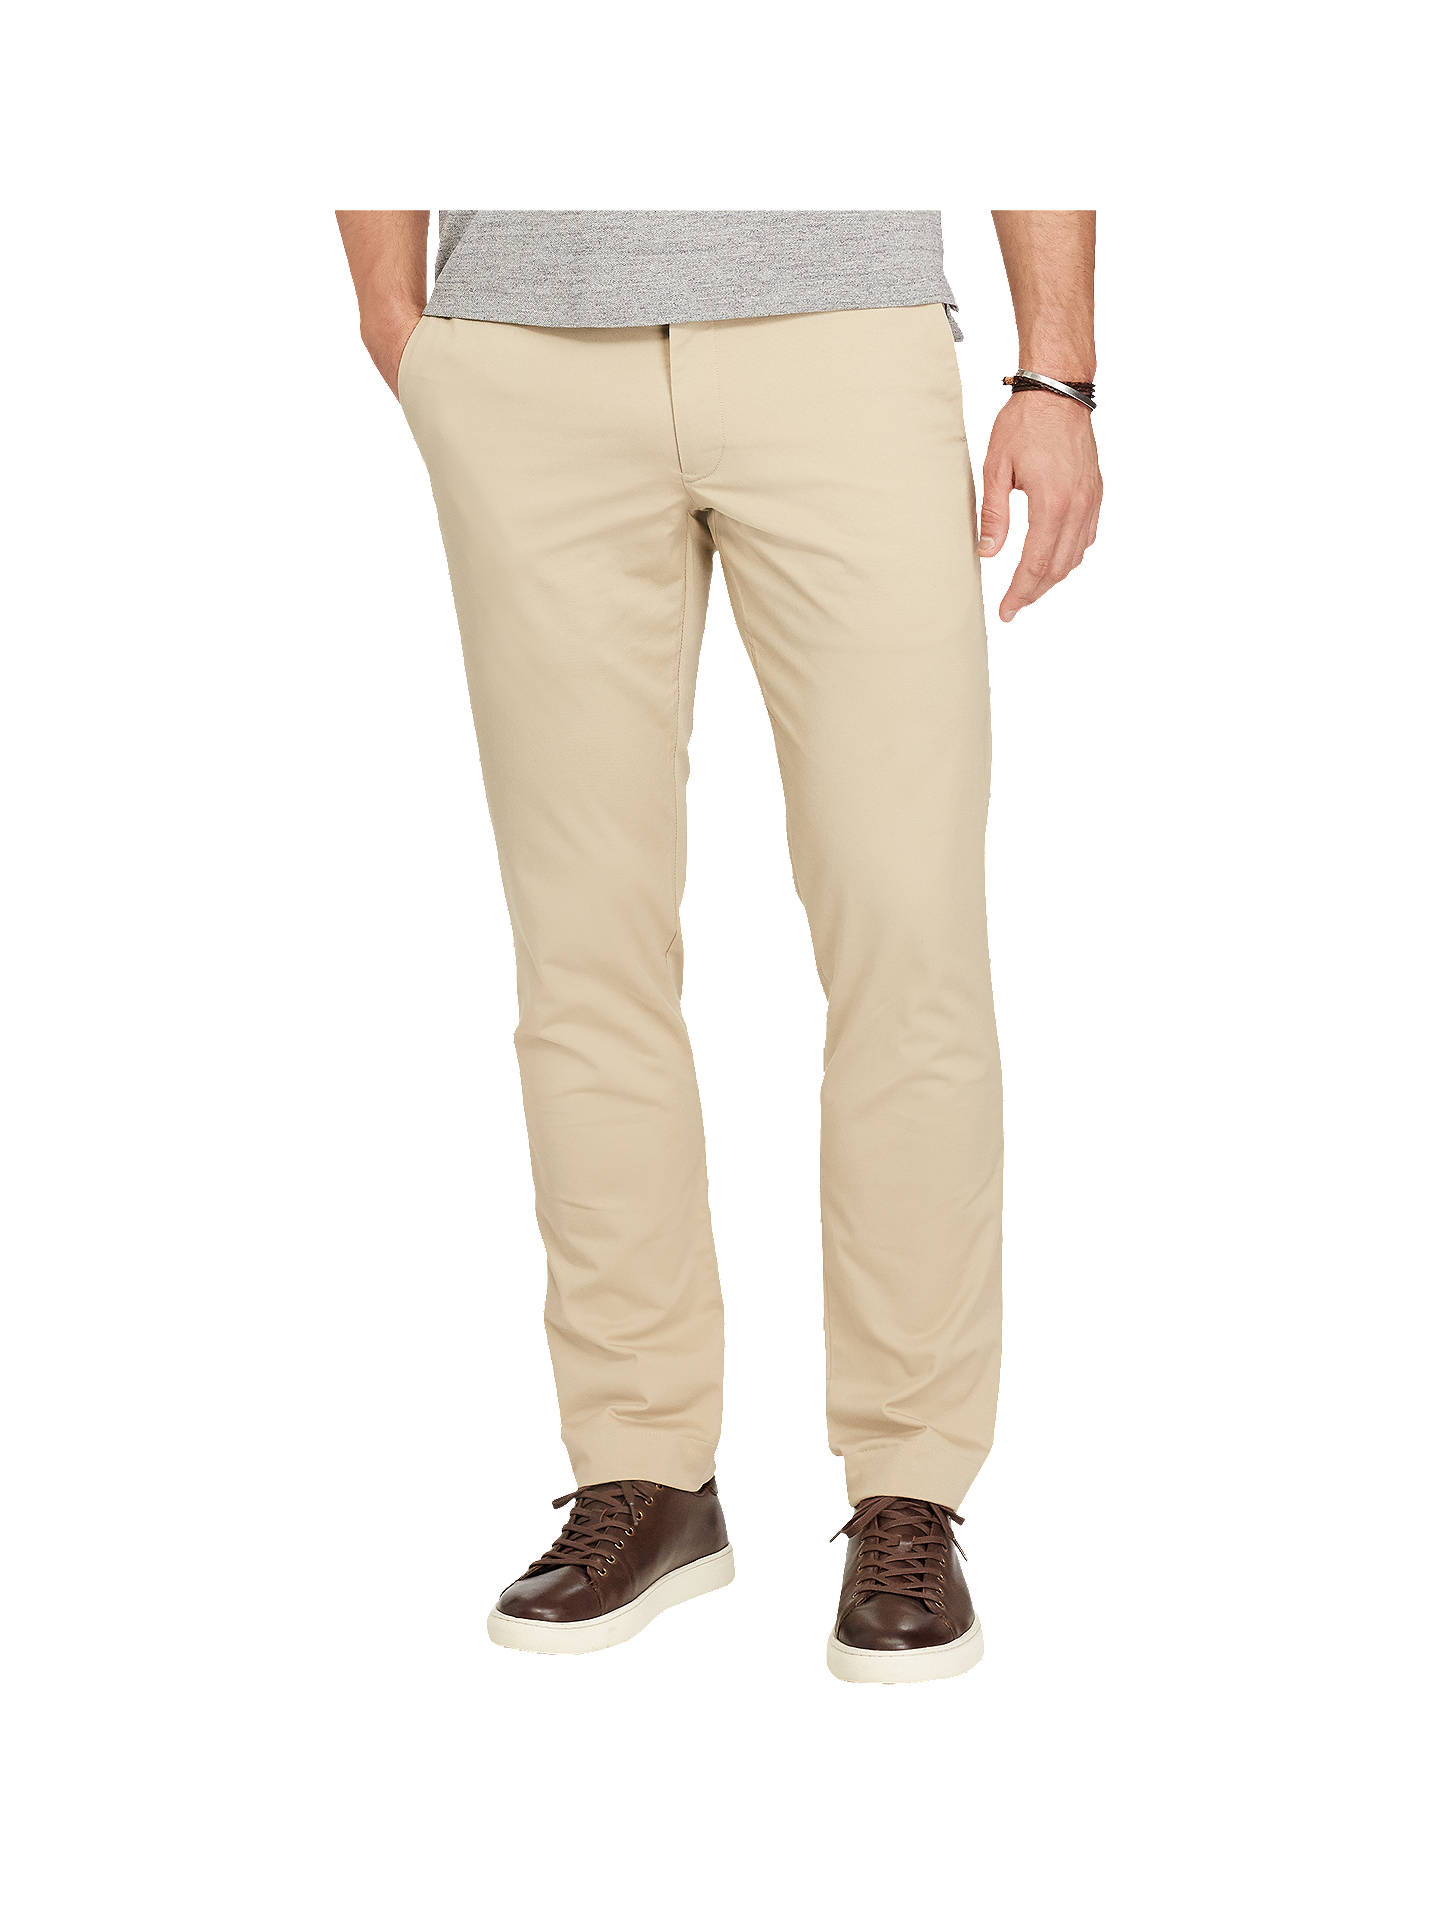 379b5c93 Polo Ralph Lauren Hudson Slim Fit Stretch Cotton Trousers, Classic Khaki